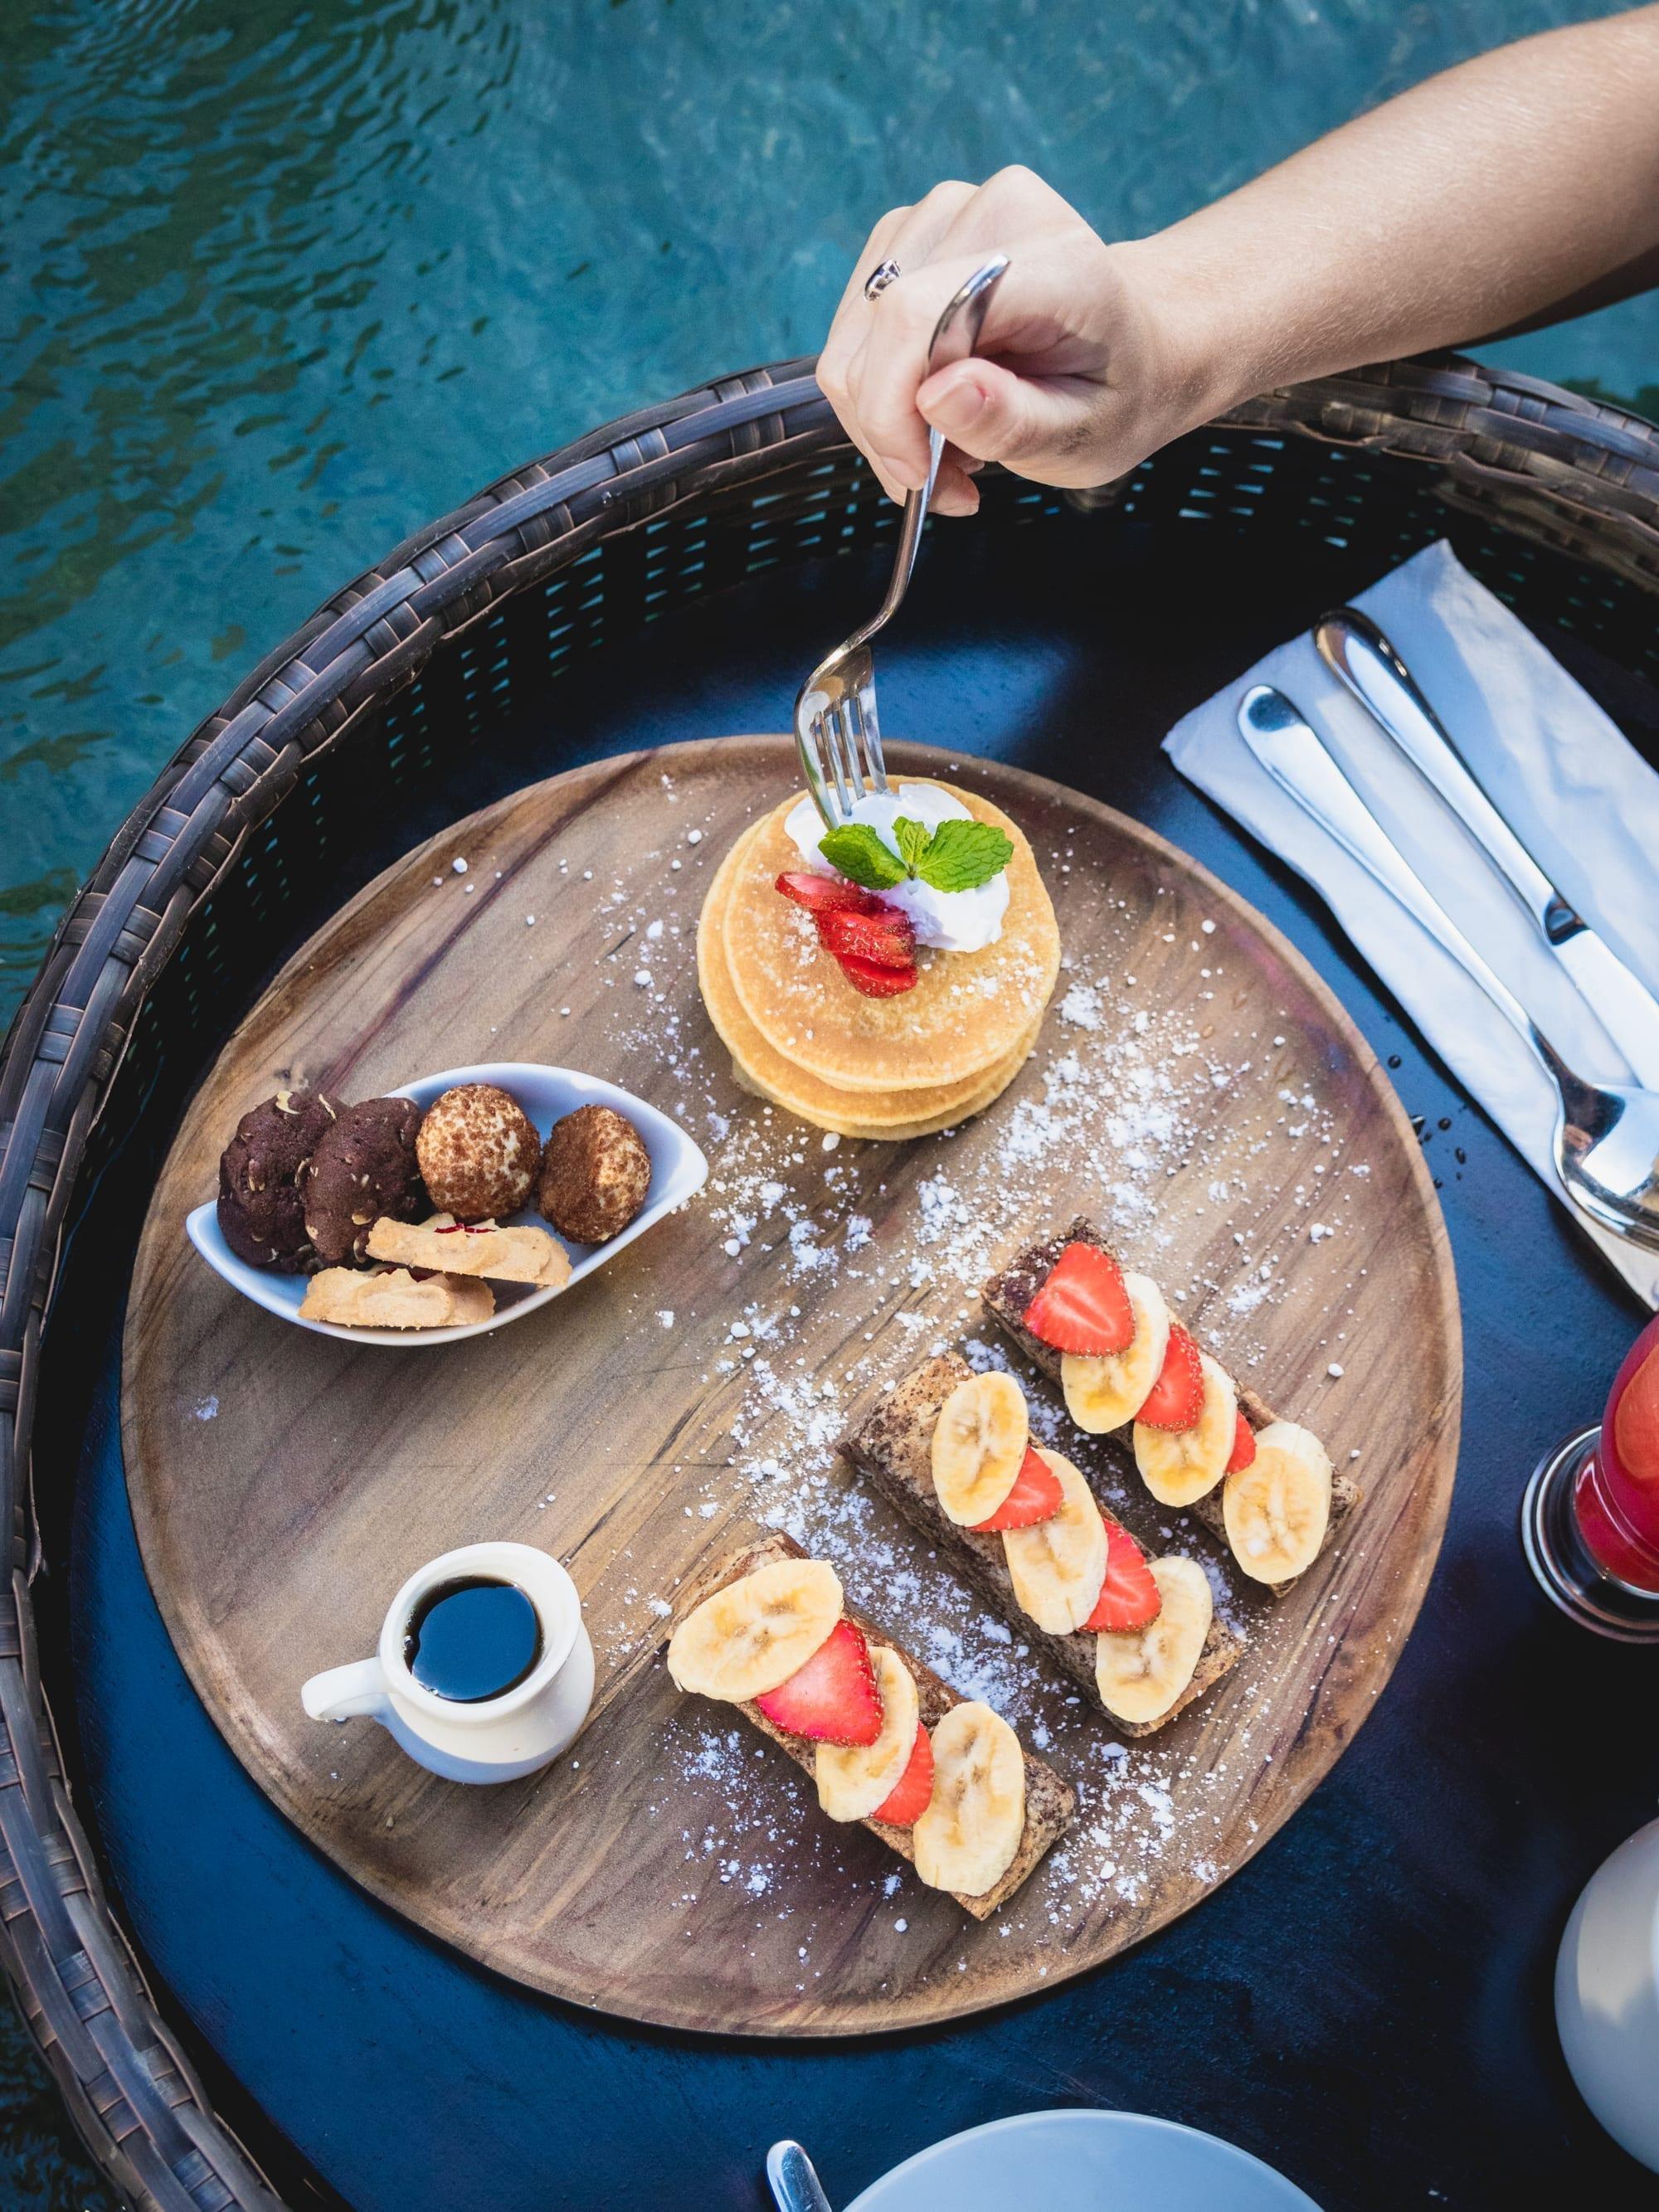 Traditional Floating breakfast in Bali